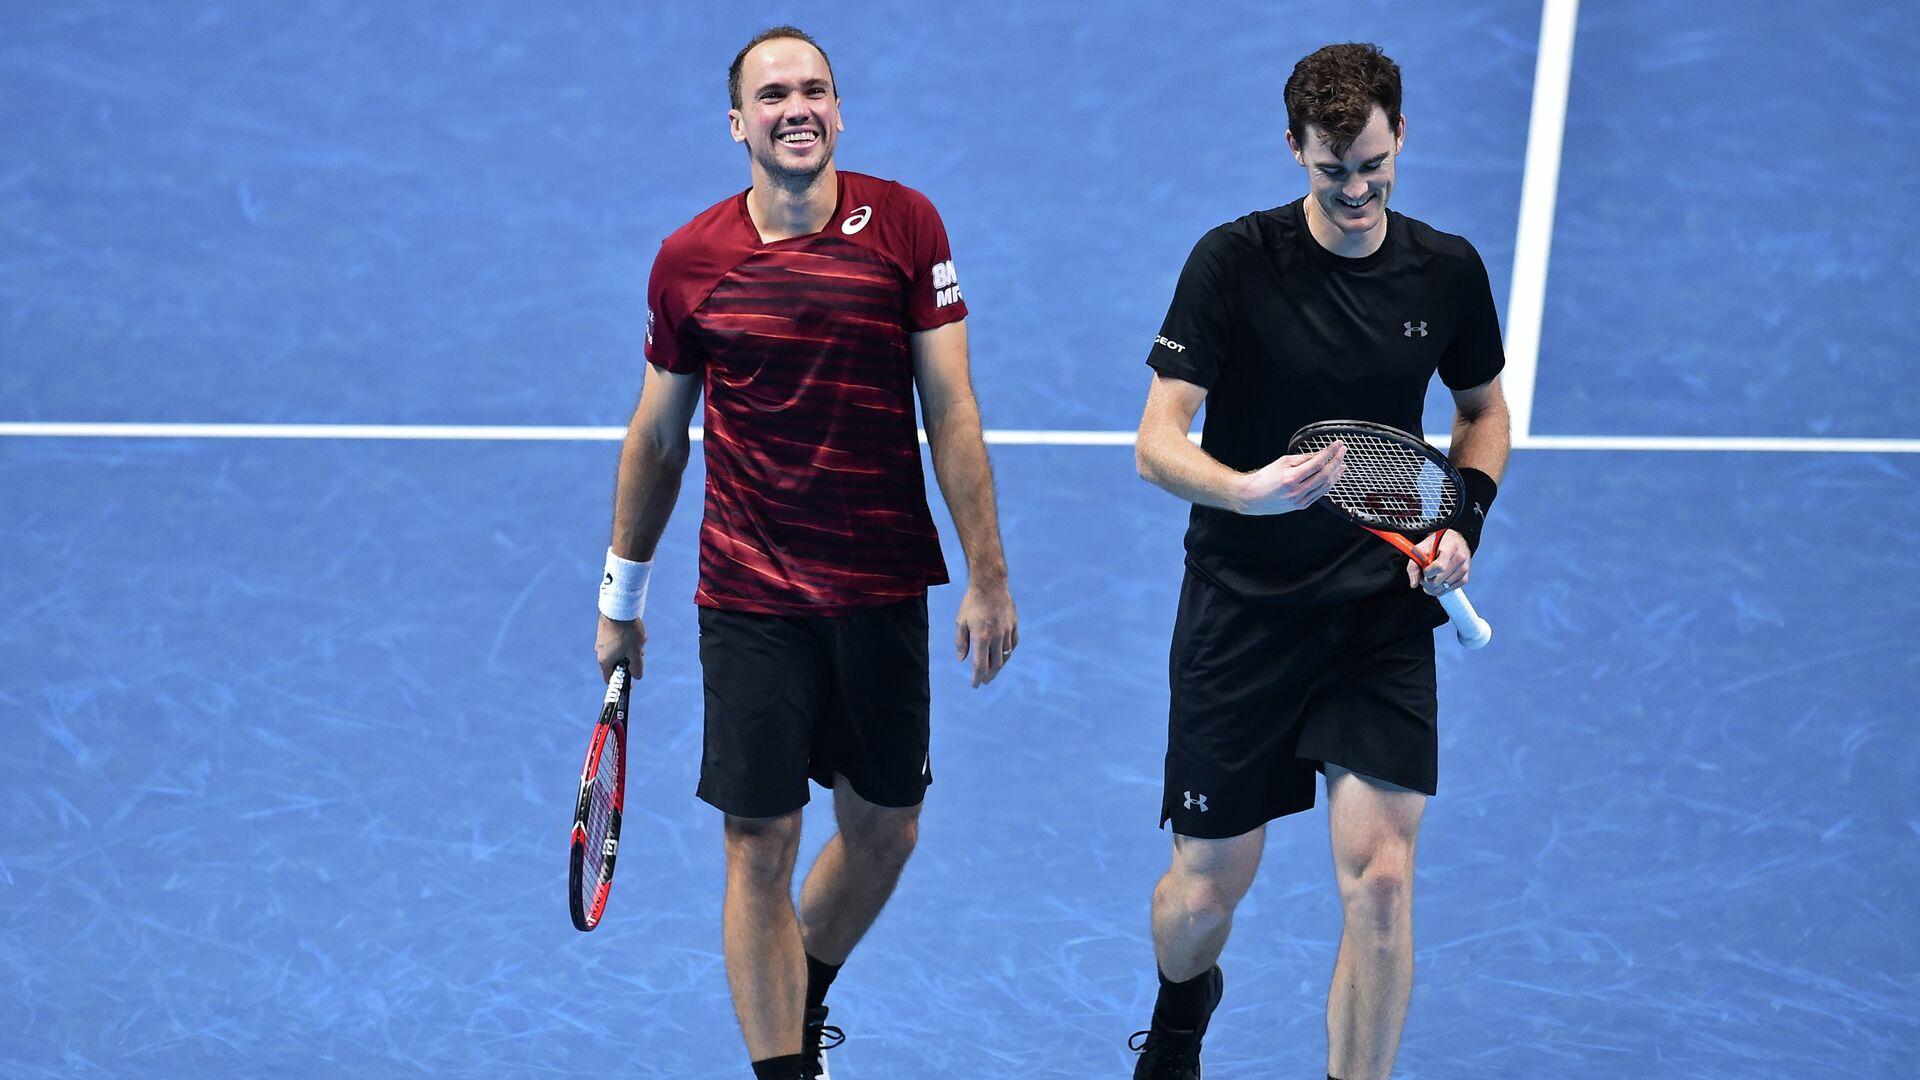 Бразильский теннисист Бруно Соарес и британец Джейми Маррей (слева направо) - РИА Новости, 1920, 21.07.2021